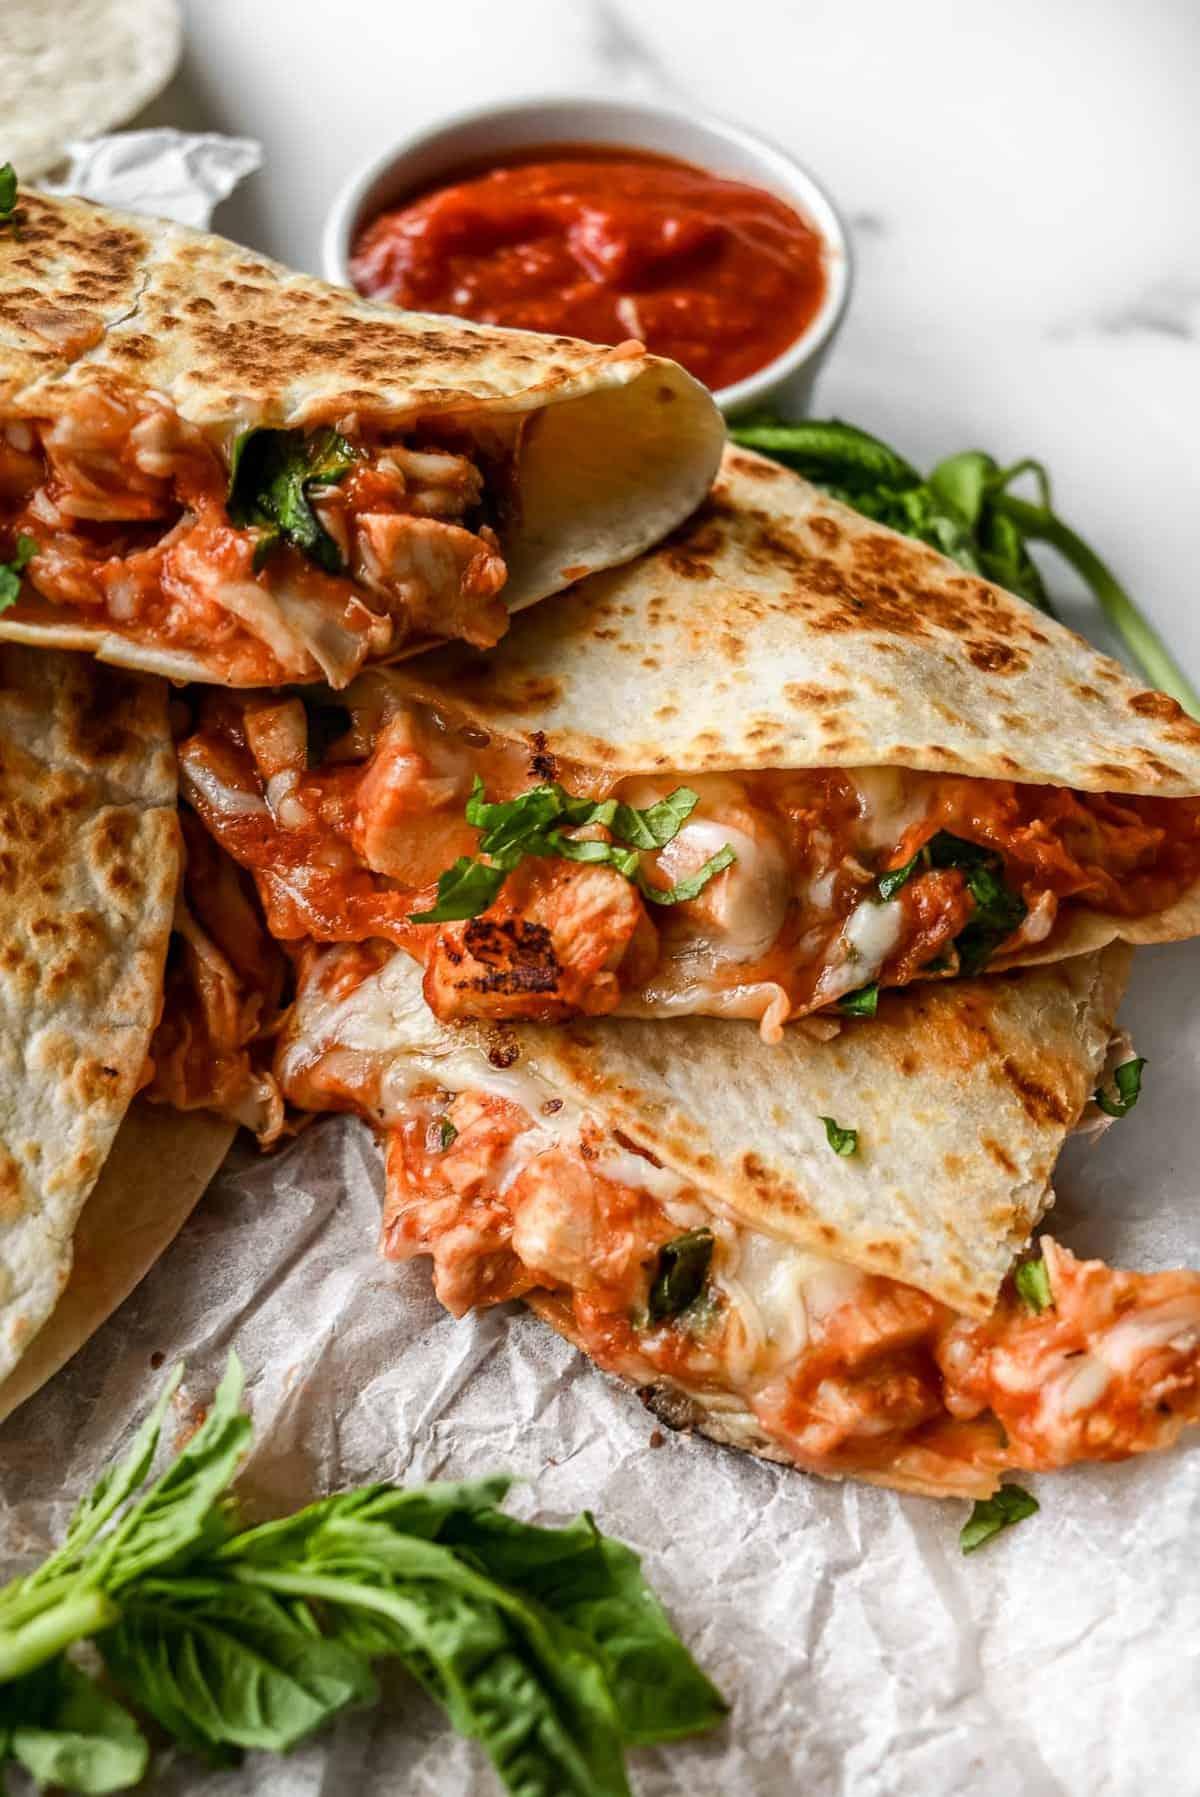 plate of pizza quesadillas